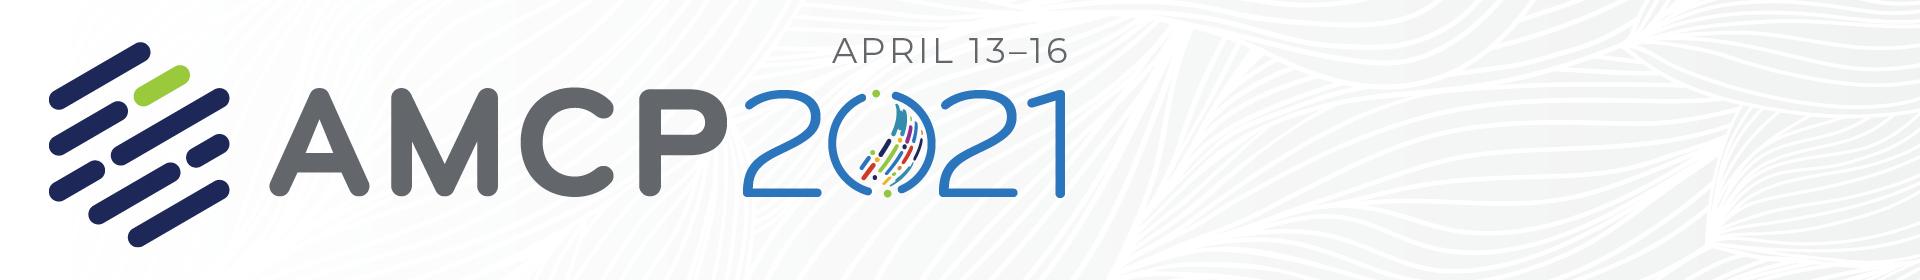 AMCP 2021  Event Banner